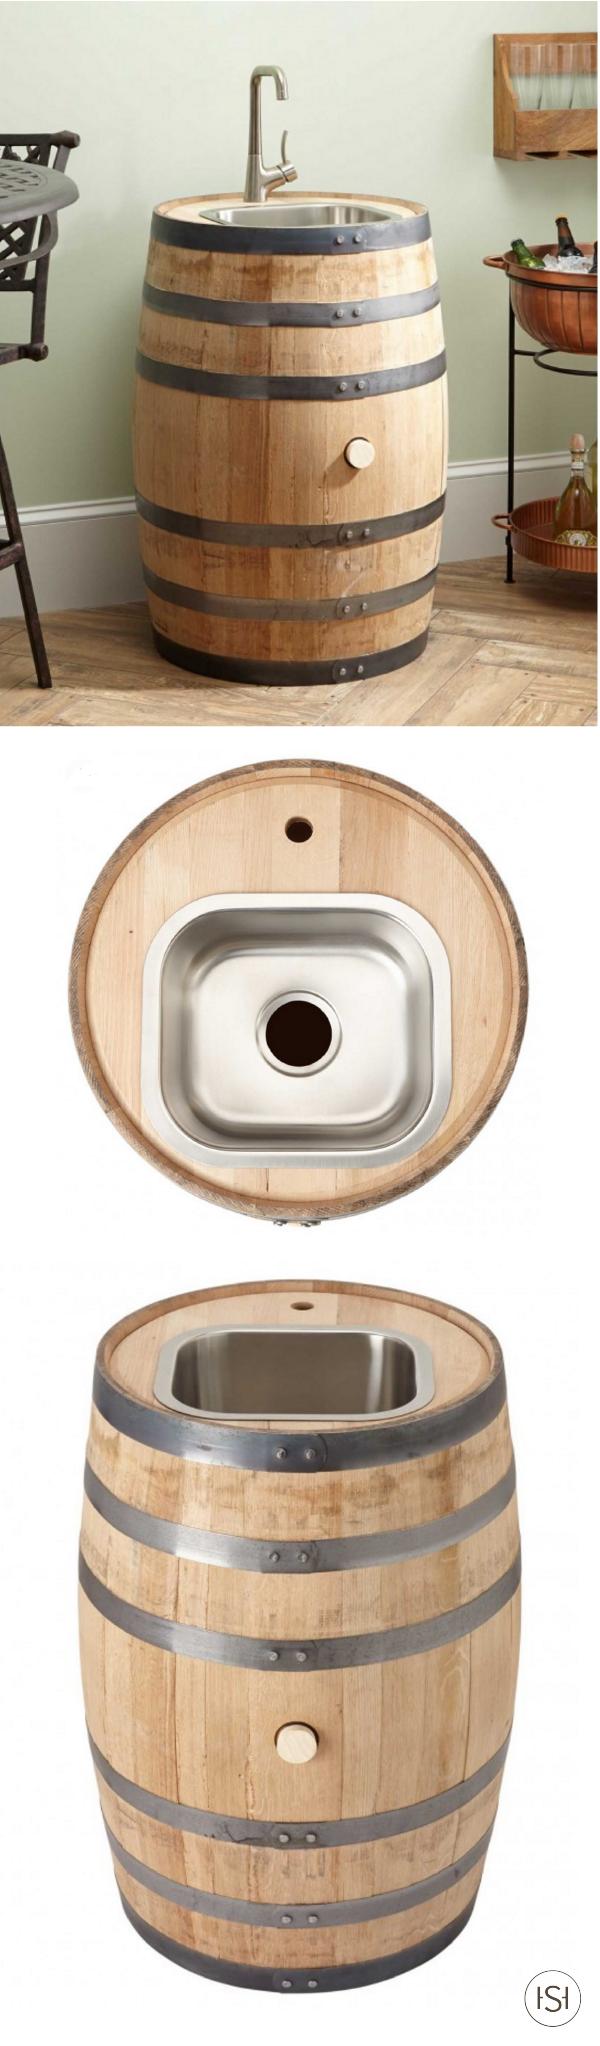 Bradman whiskey barrel bar sink square stainless steel for Man cave bathroom sink